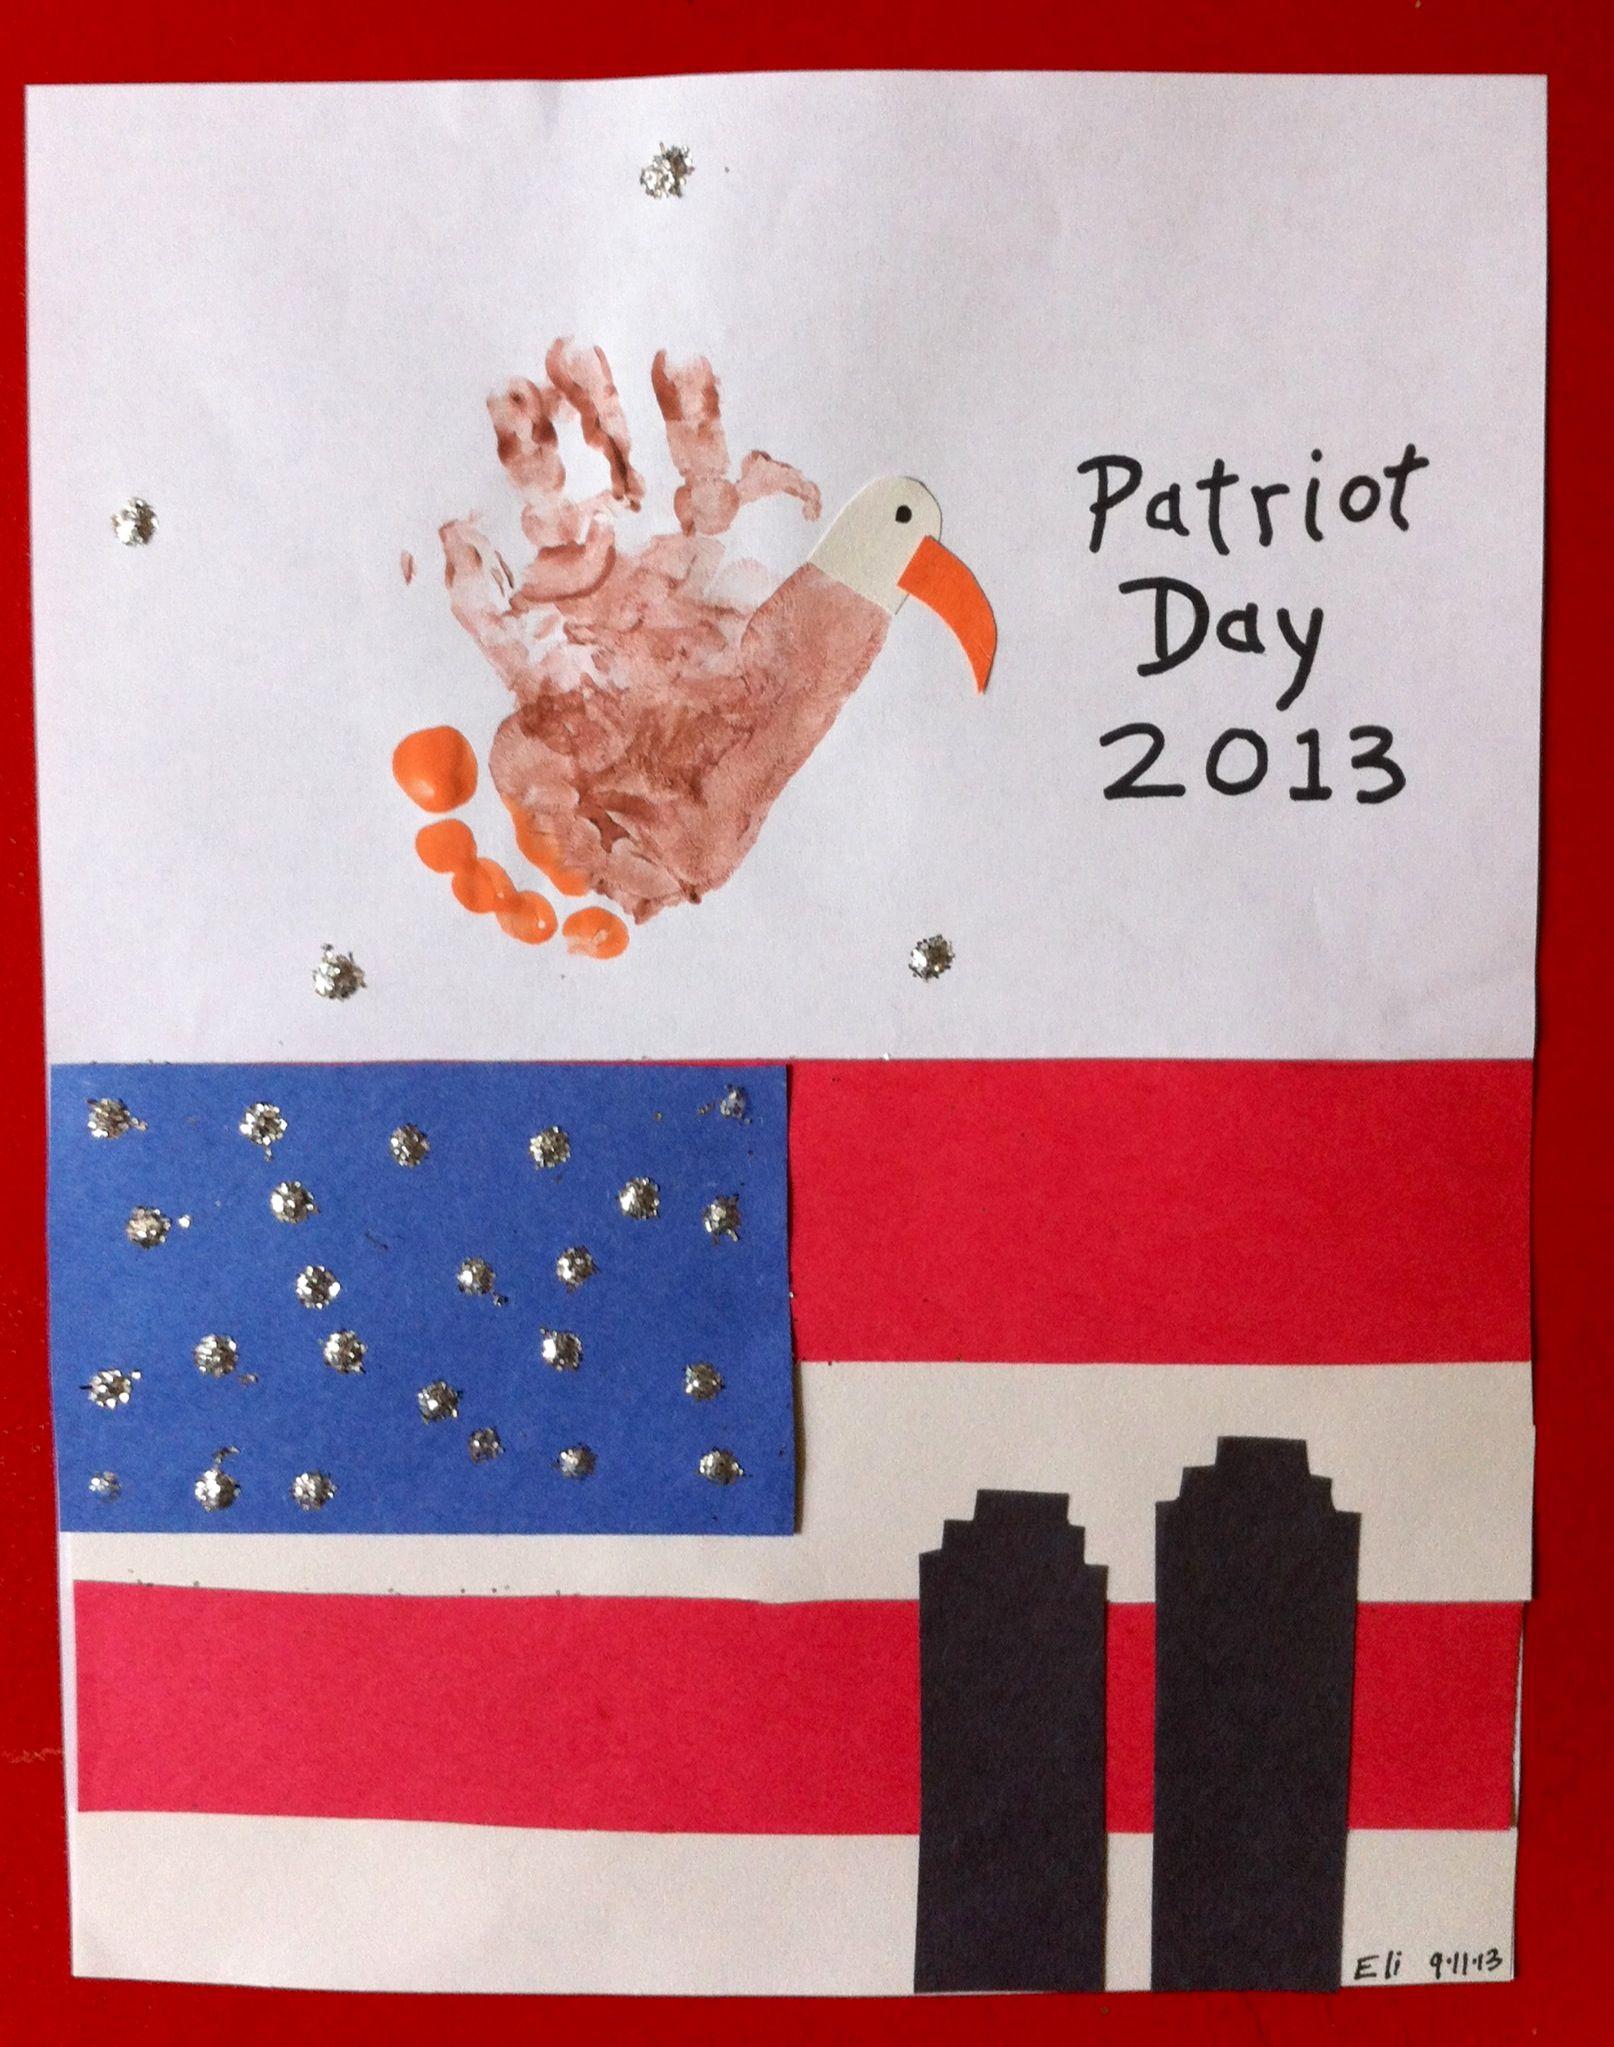 Patriot Day Footprint Handprint Craft Patriotday 9 11 Twintowers Handprint Crafts Elementary School Fun Footprint Art